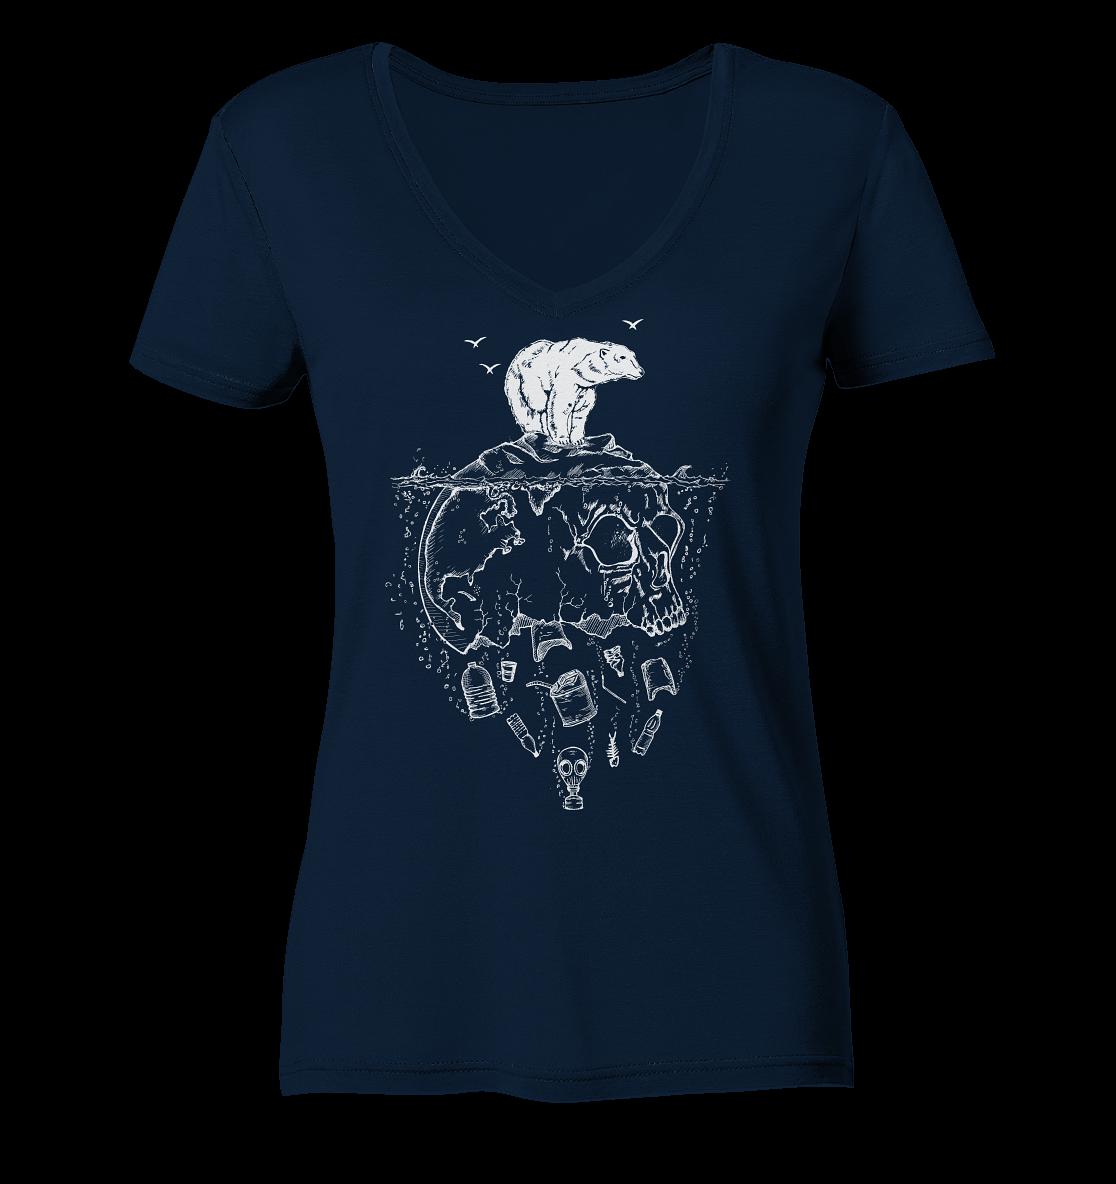 front-ladies-organic-v-neck-shirt-0e2035-1116x-3.png